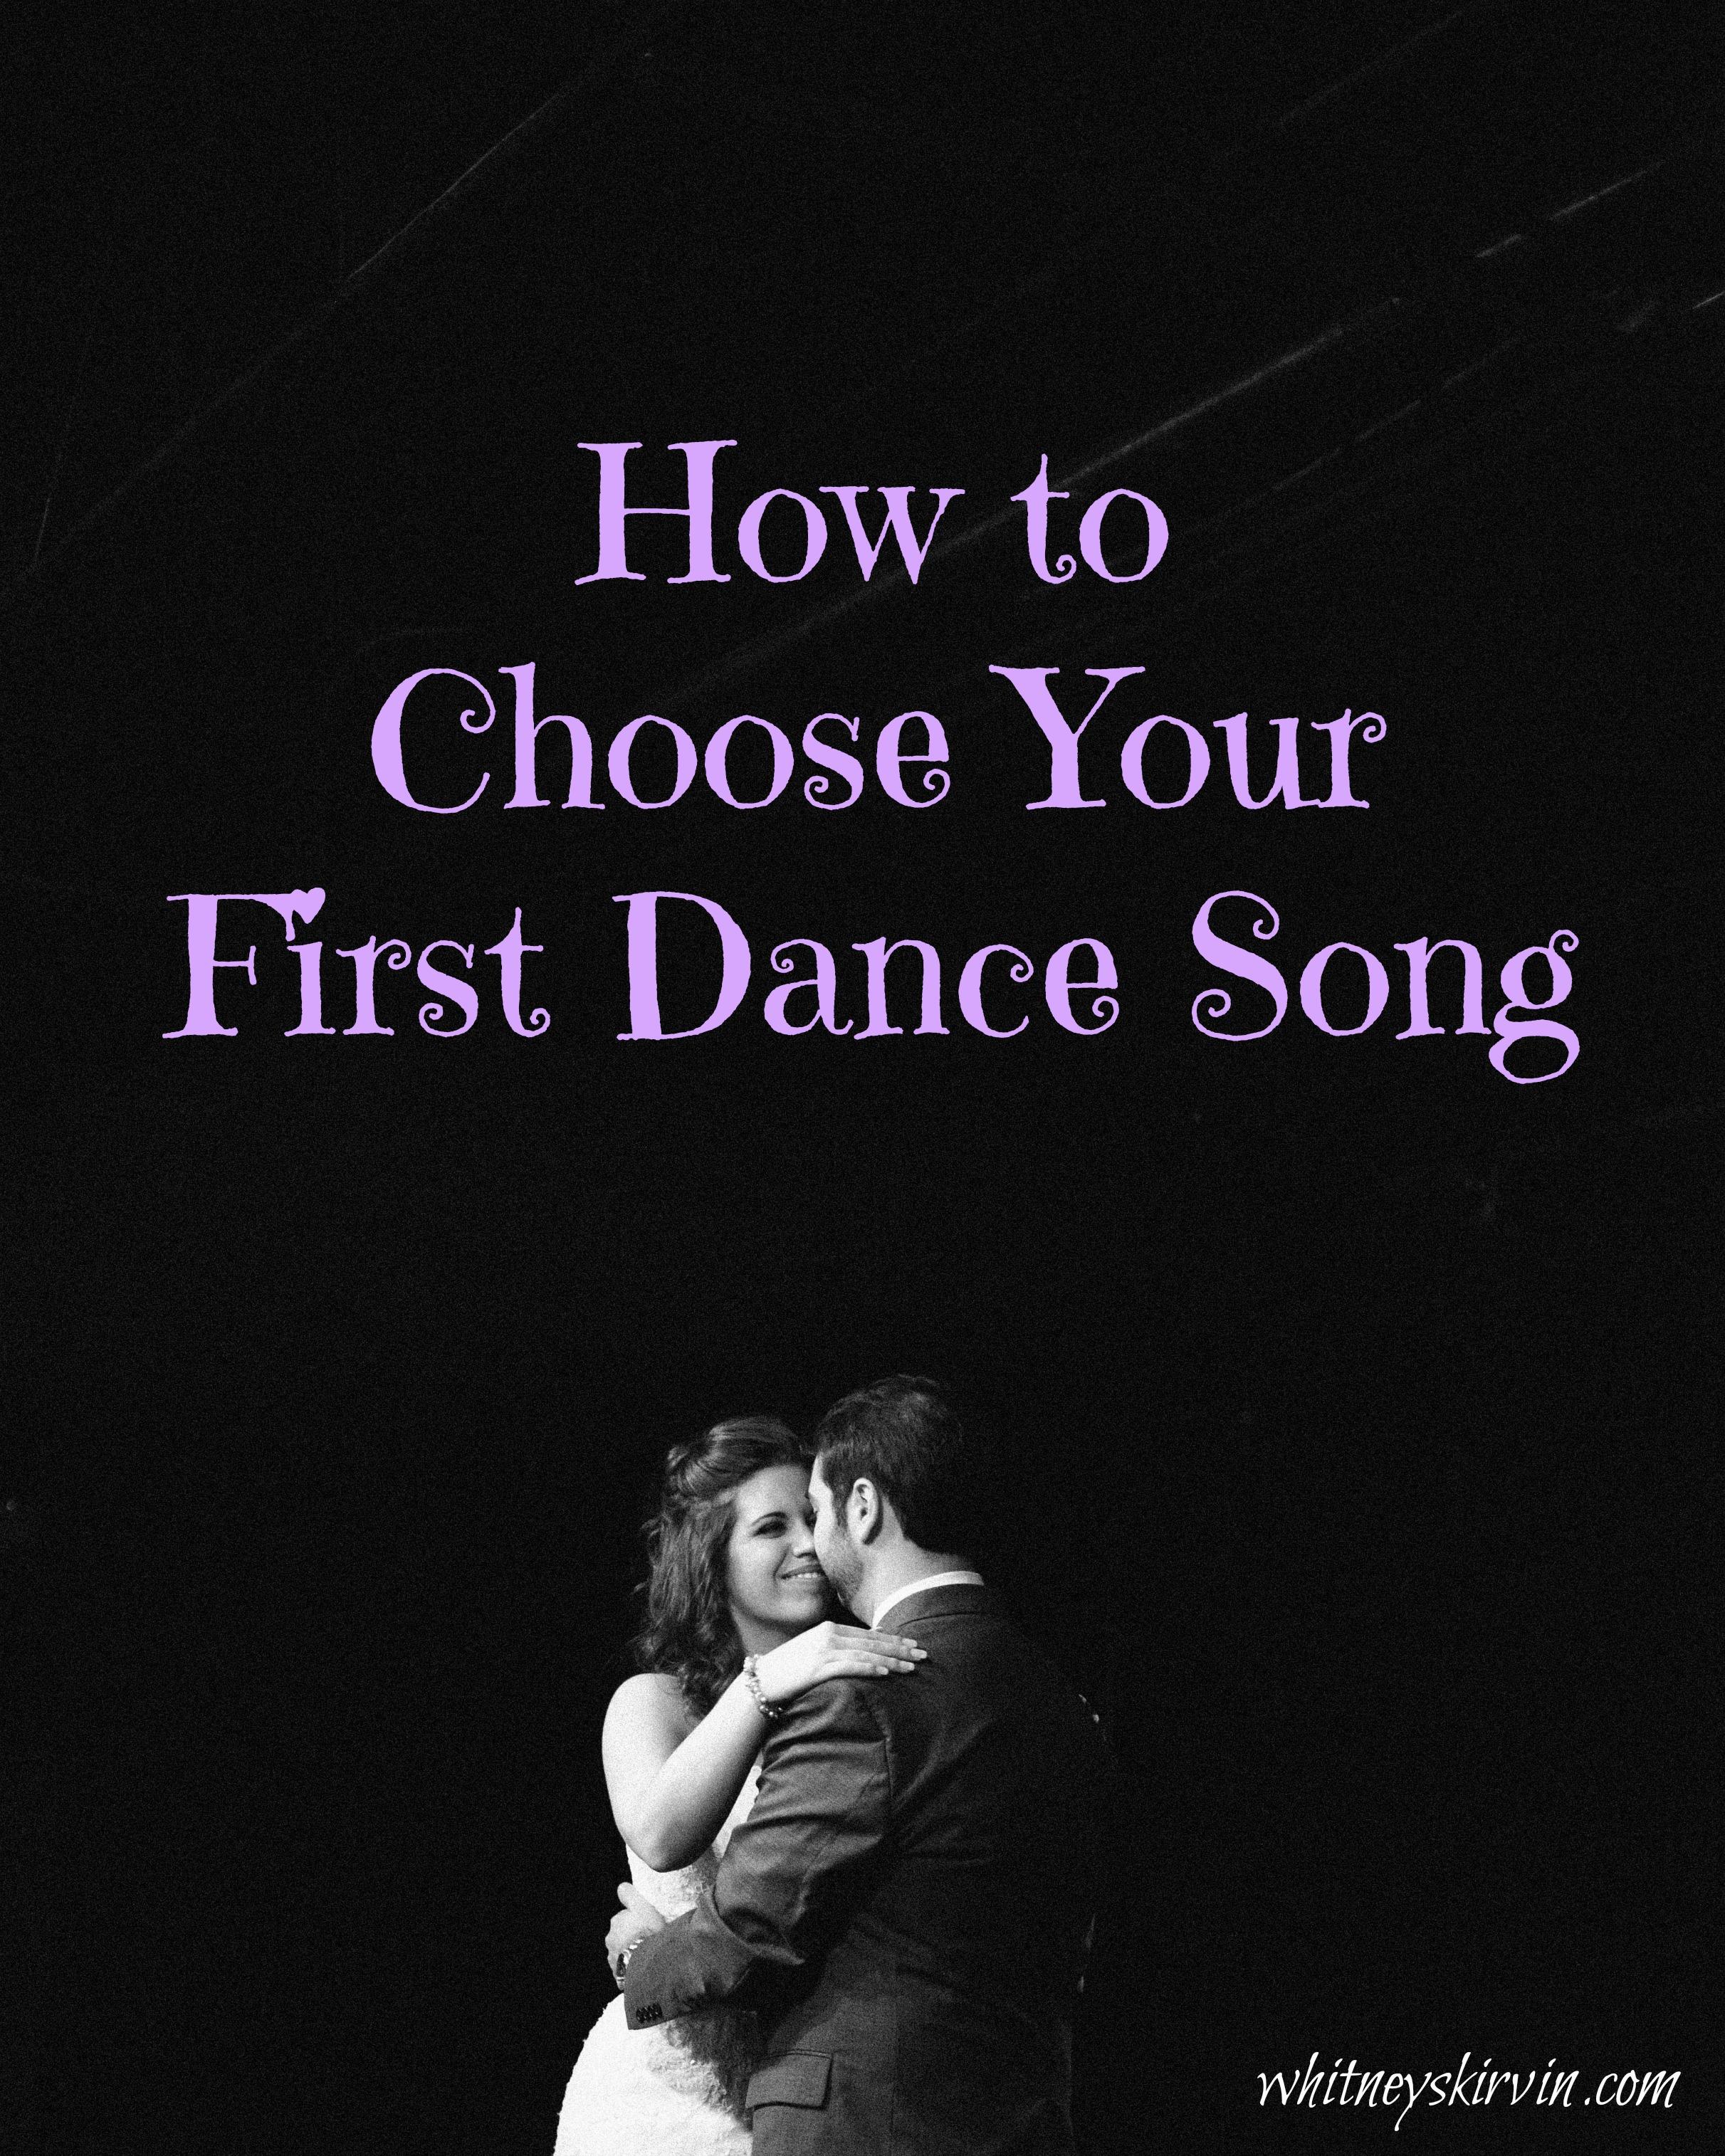 howtochoosefirstdancesong.jpg